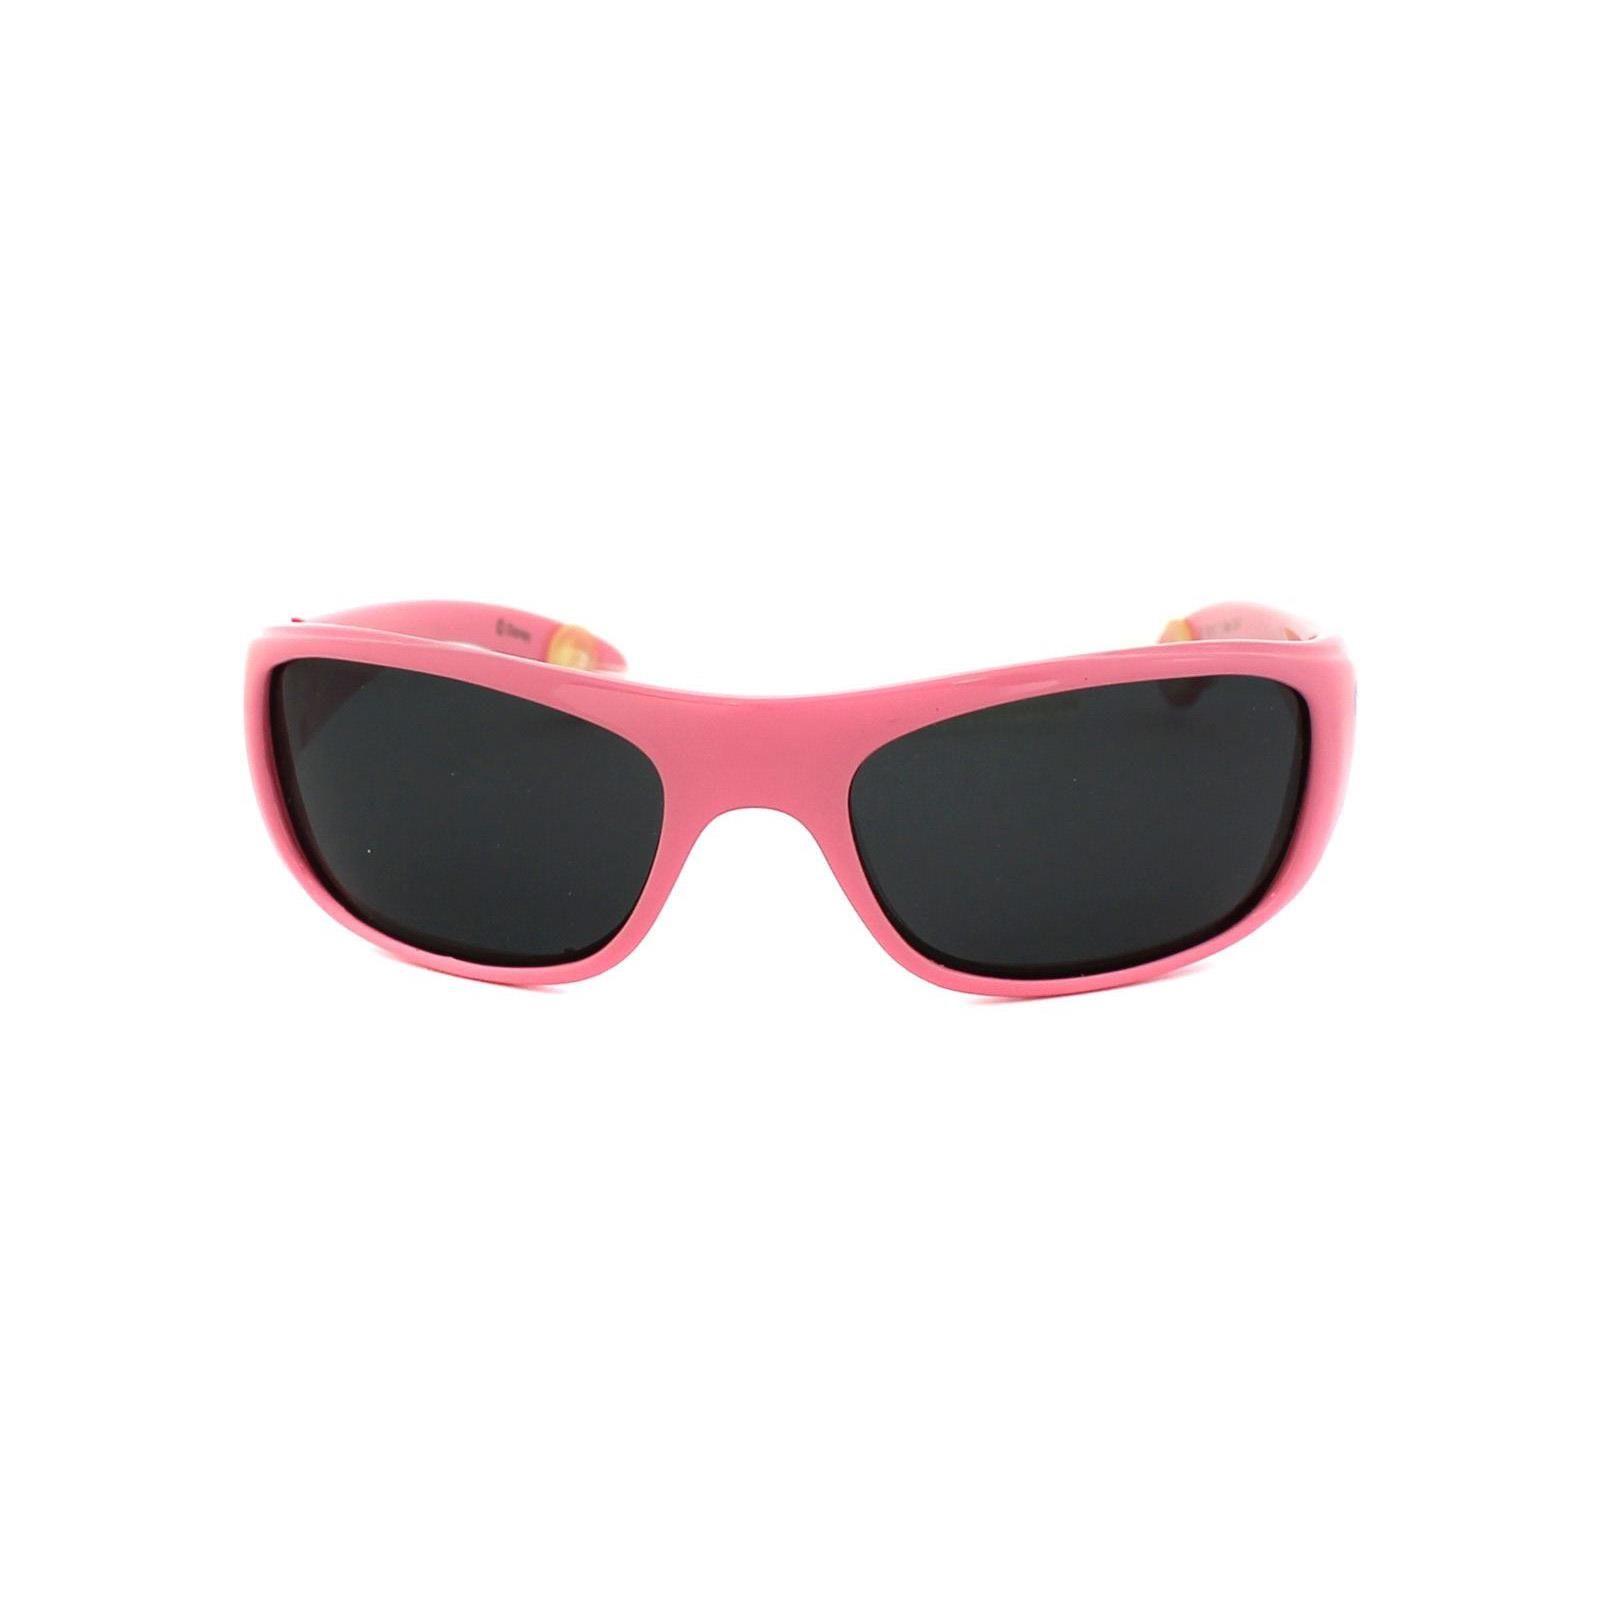 Disney Sunglasses Mickey Mouse D0103 C Rose Black Polarized